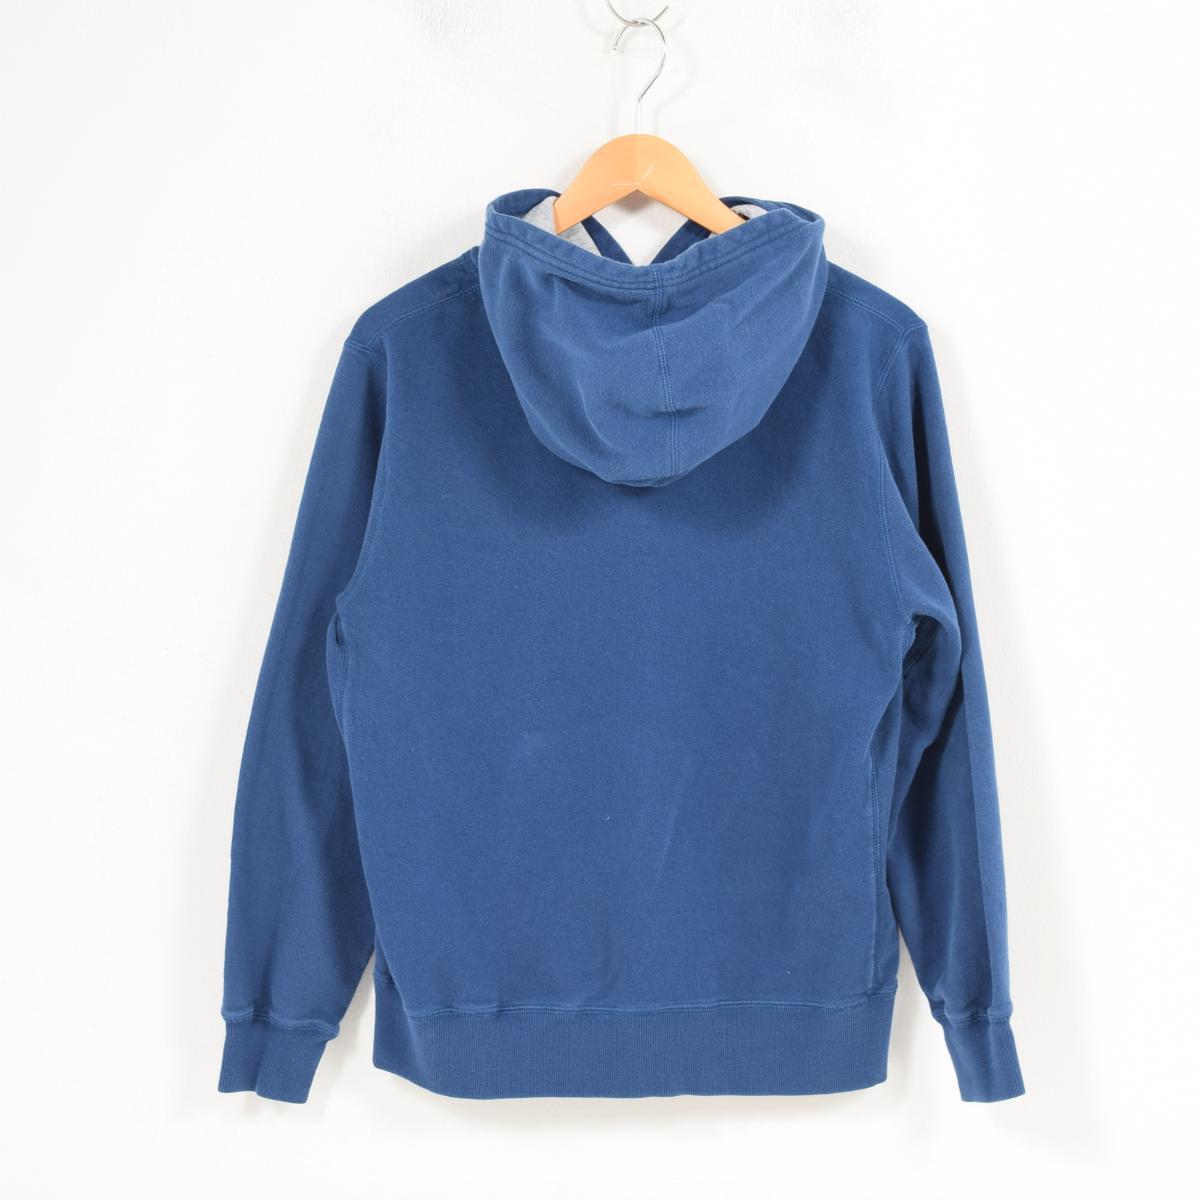 Nike NIKE sweat shirt pullover parka men S wal3603